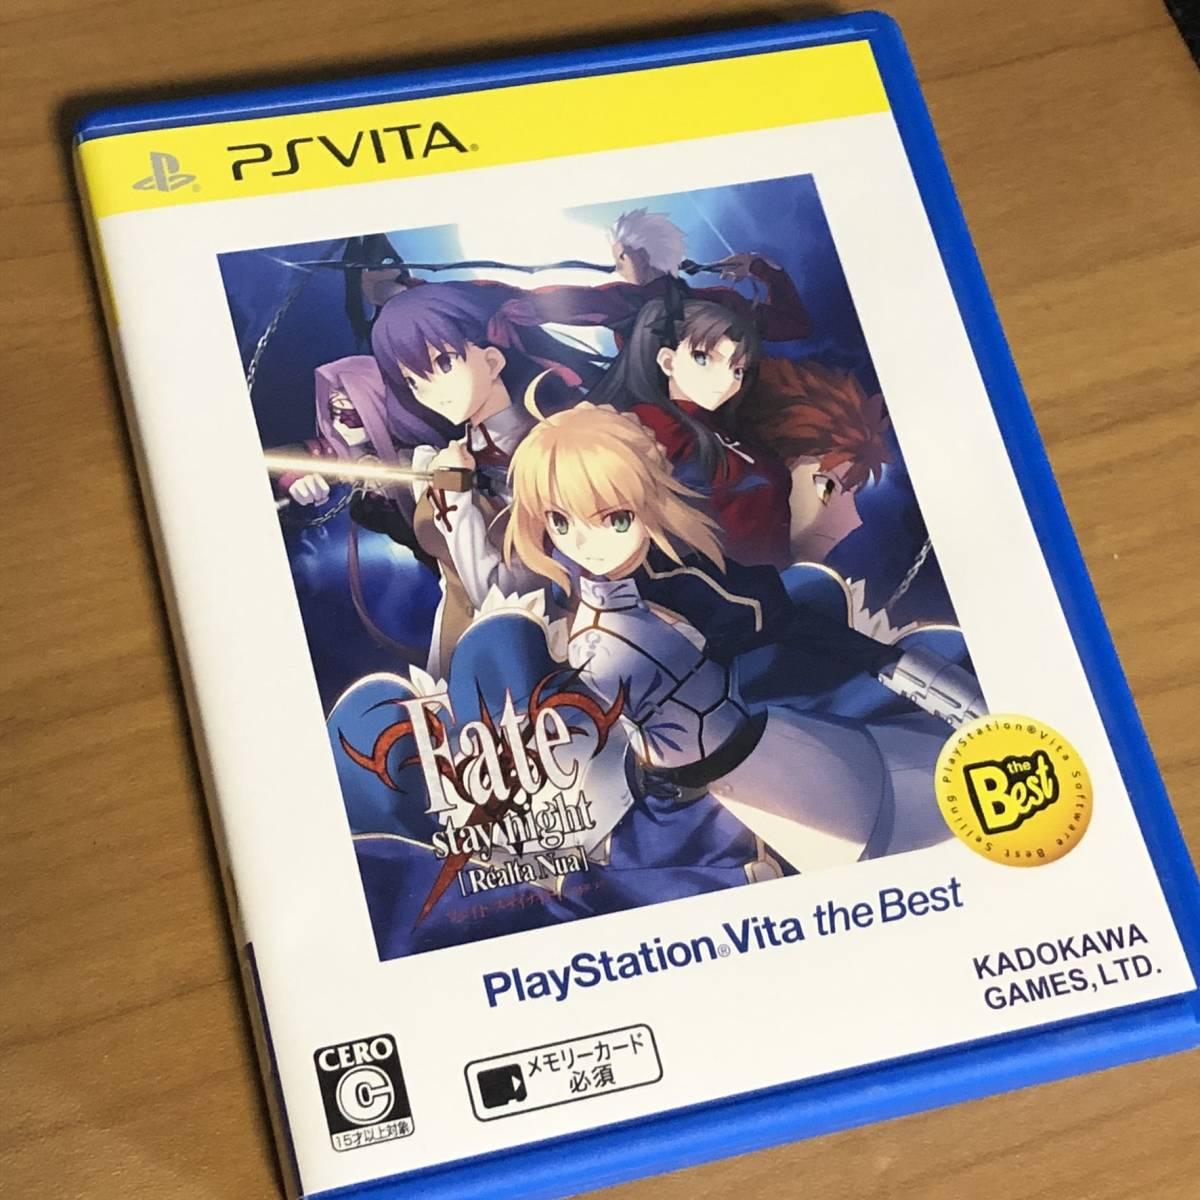 Fate/stay night [Realta Nua] PlayStation Vita the Best - PS Vita フェイト ステイナイト レアルタ・ヌア